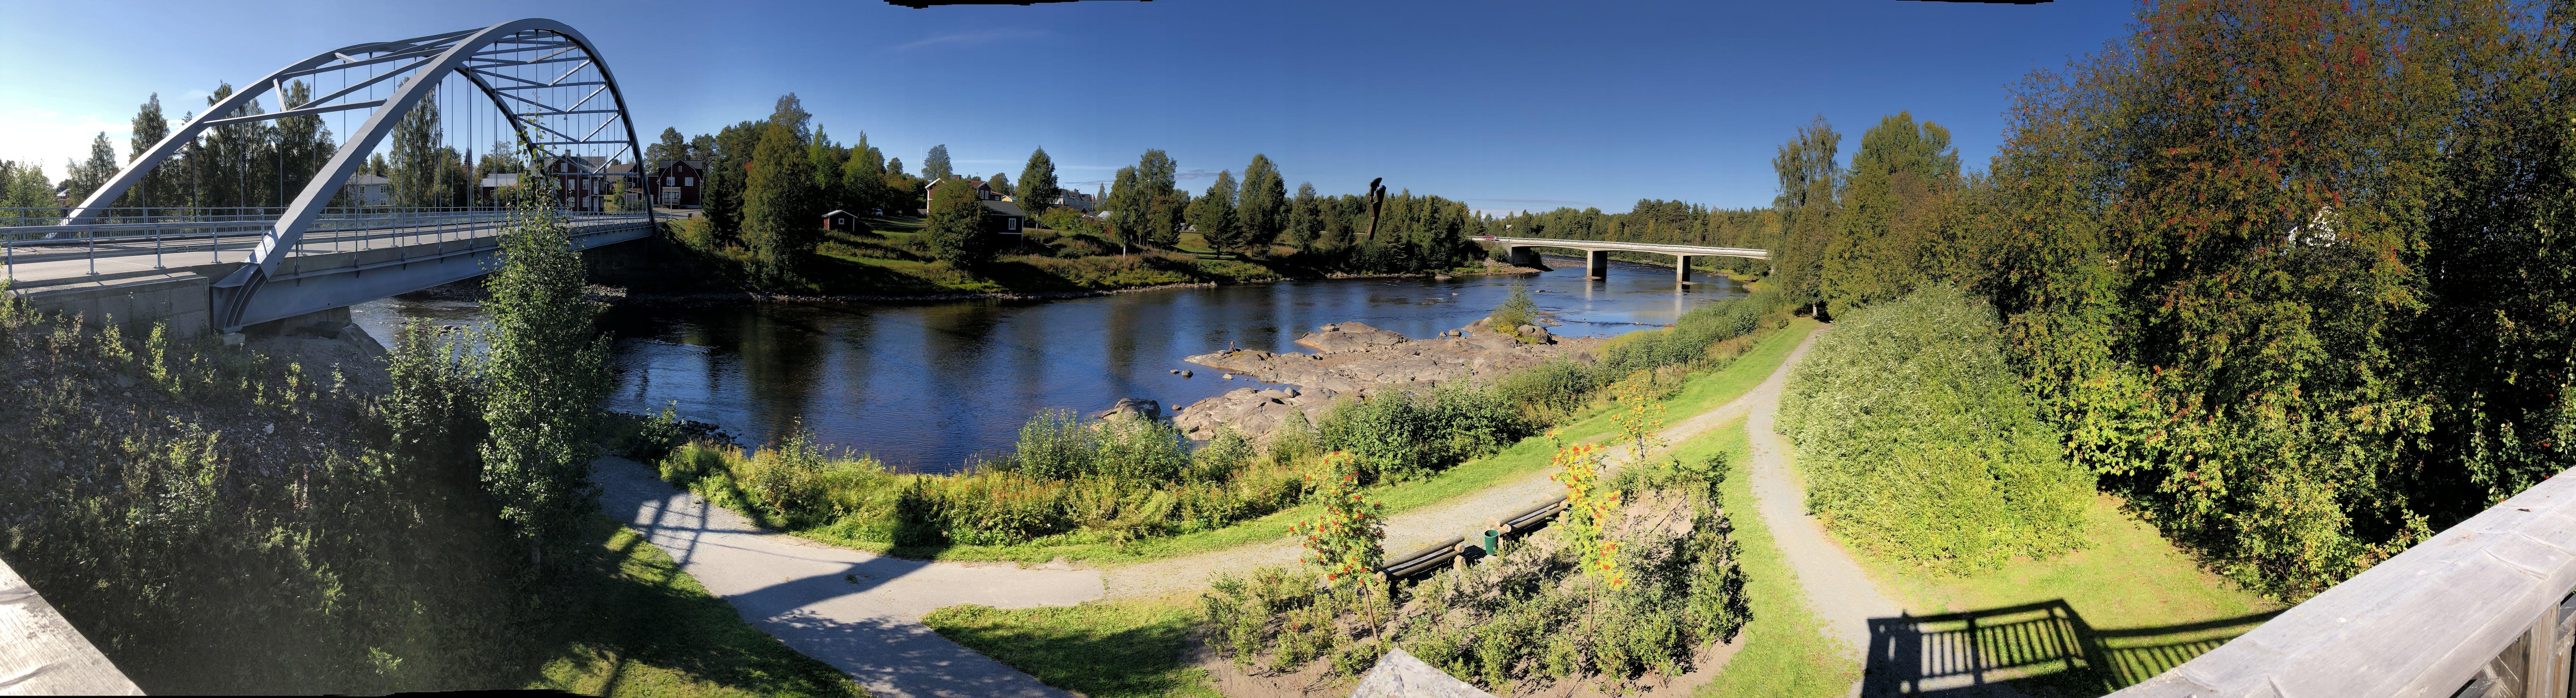 Free stock photo of river, salmon, Byske